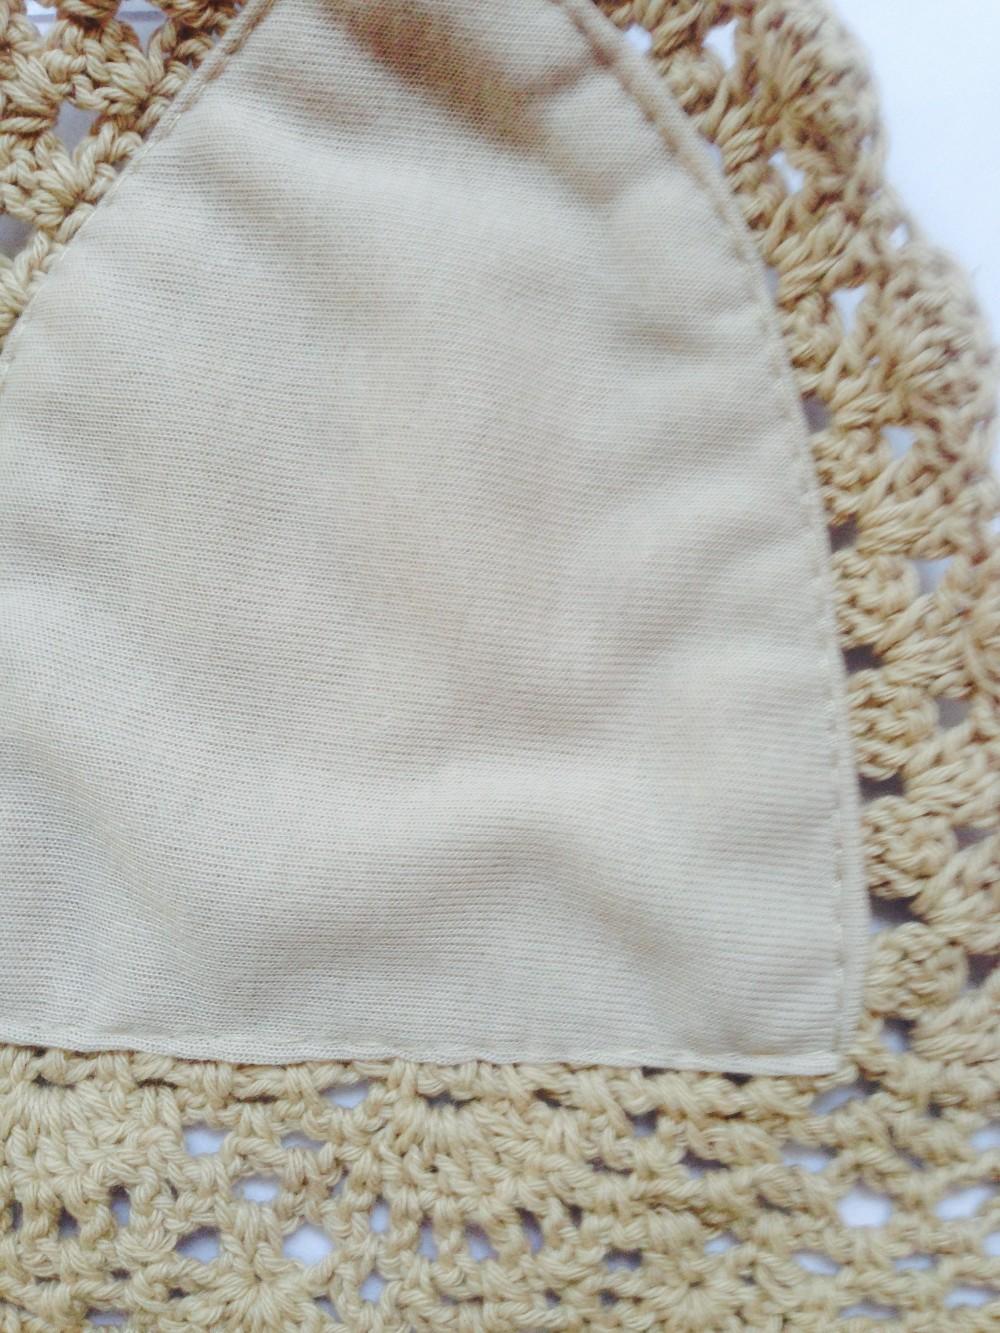 HTB13YopLpXXXXXjXFXXq6xXFXXXL - FREE SHIPPING Womens Bralette Halter Neck Crop Top Knit Crochet JKP180